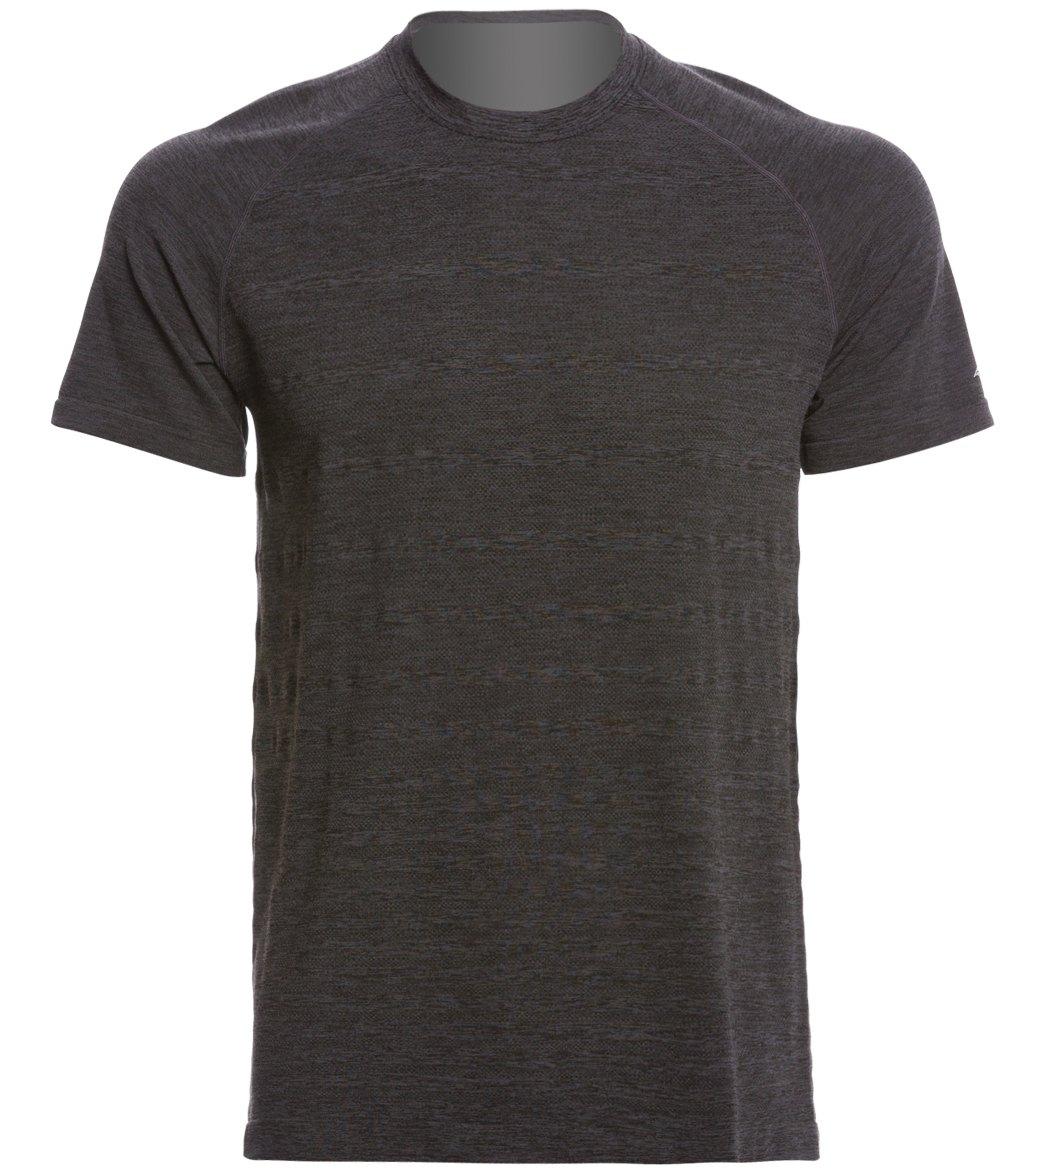 b2b6c6abb8 Saucony Men's Dash Seamless Short Sleeve Shirt